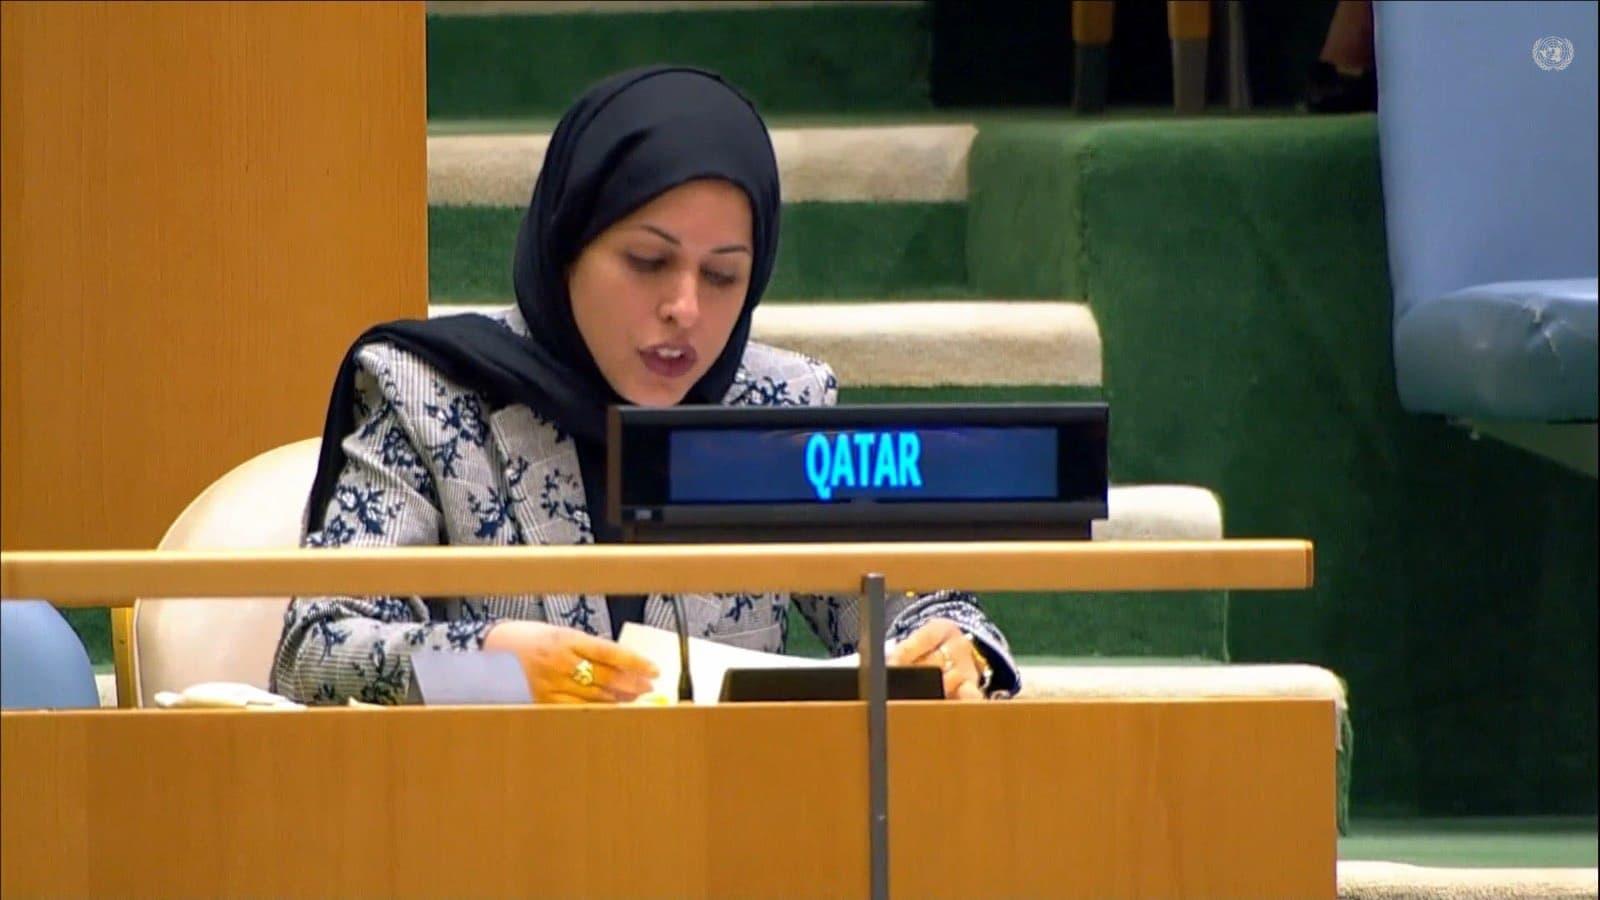 'Qatar will remain platform for co-operation among all nations:' Sheikha Alya